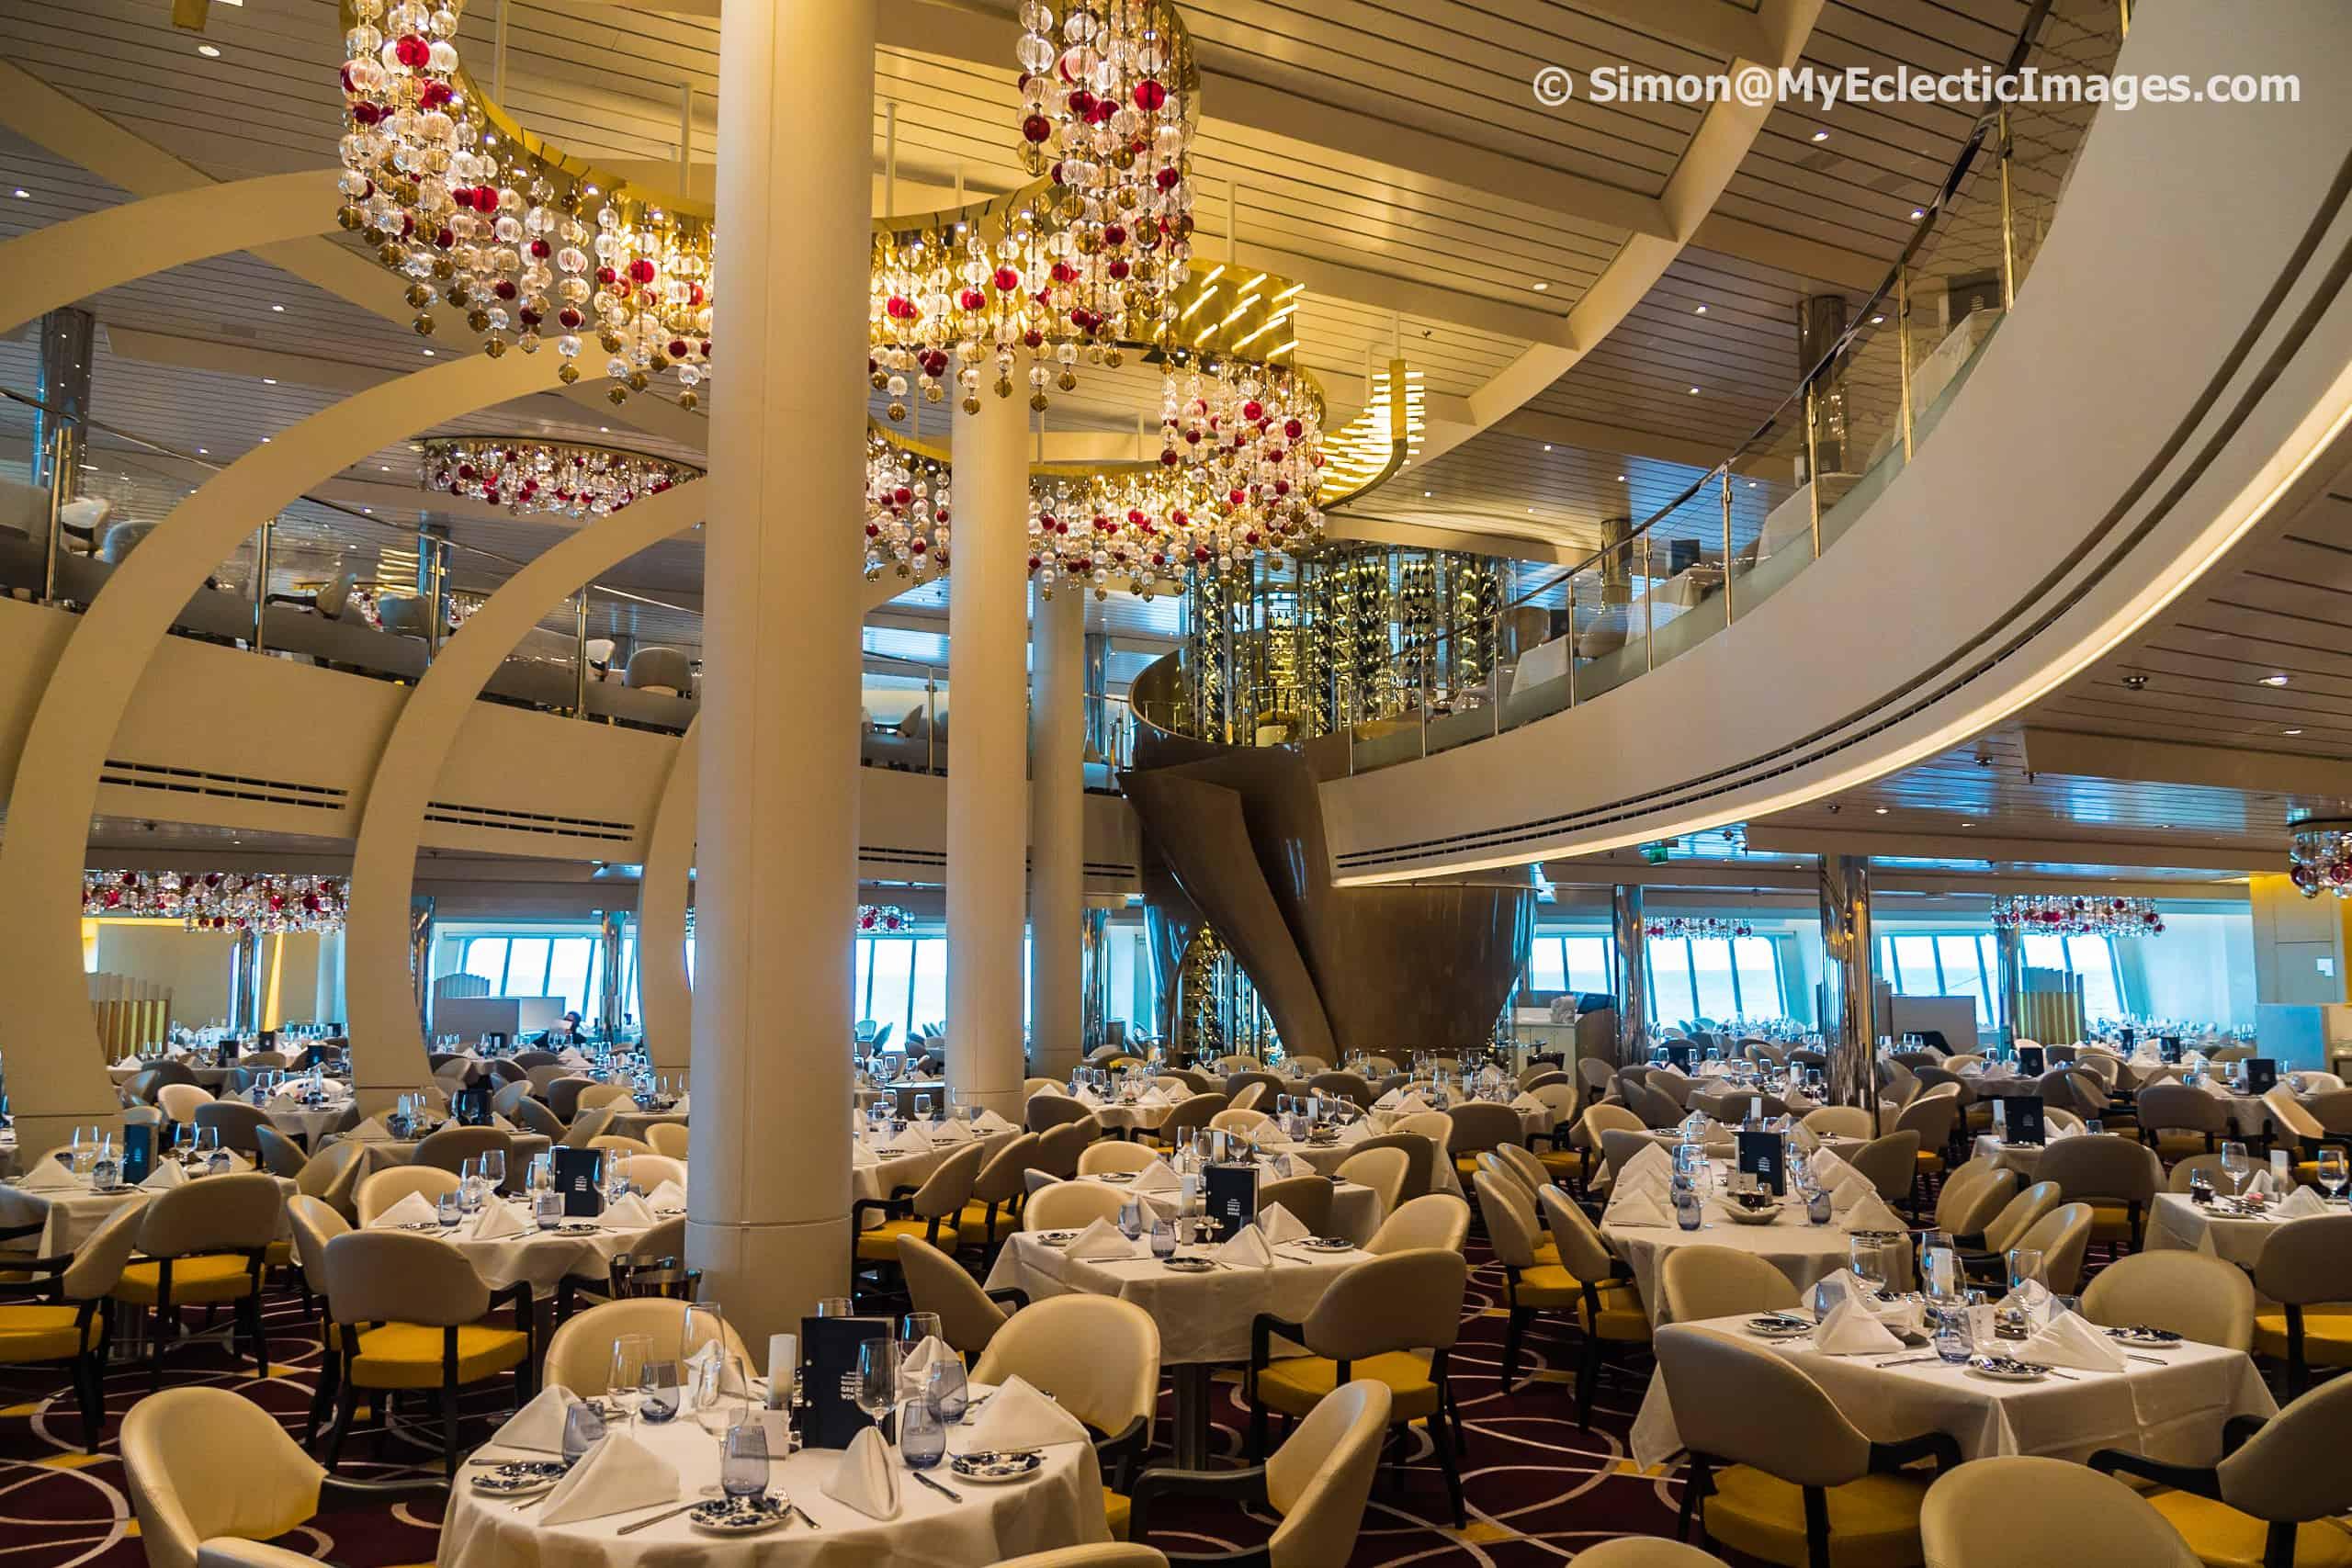 The Formal Dining Room Nieuw Statendam